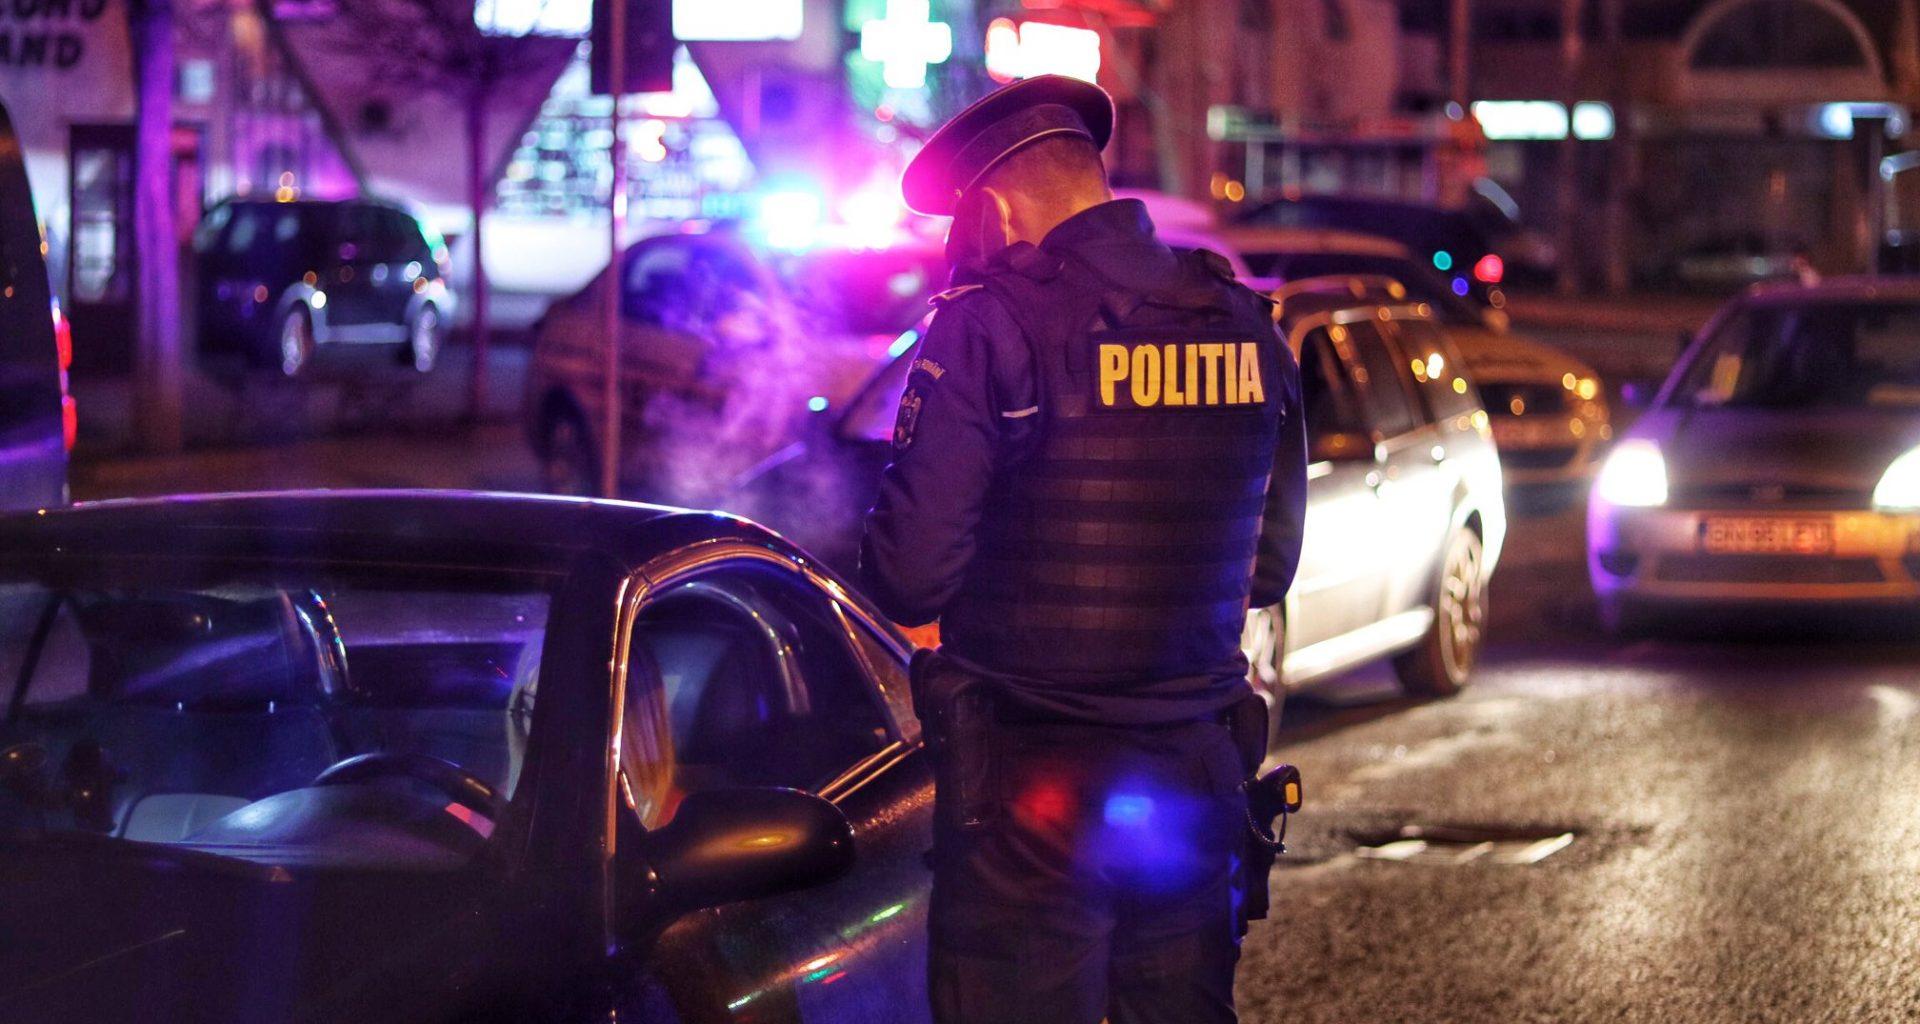 Police - COVID19